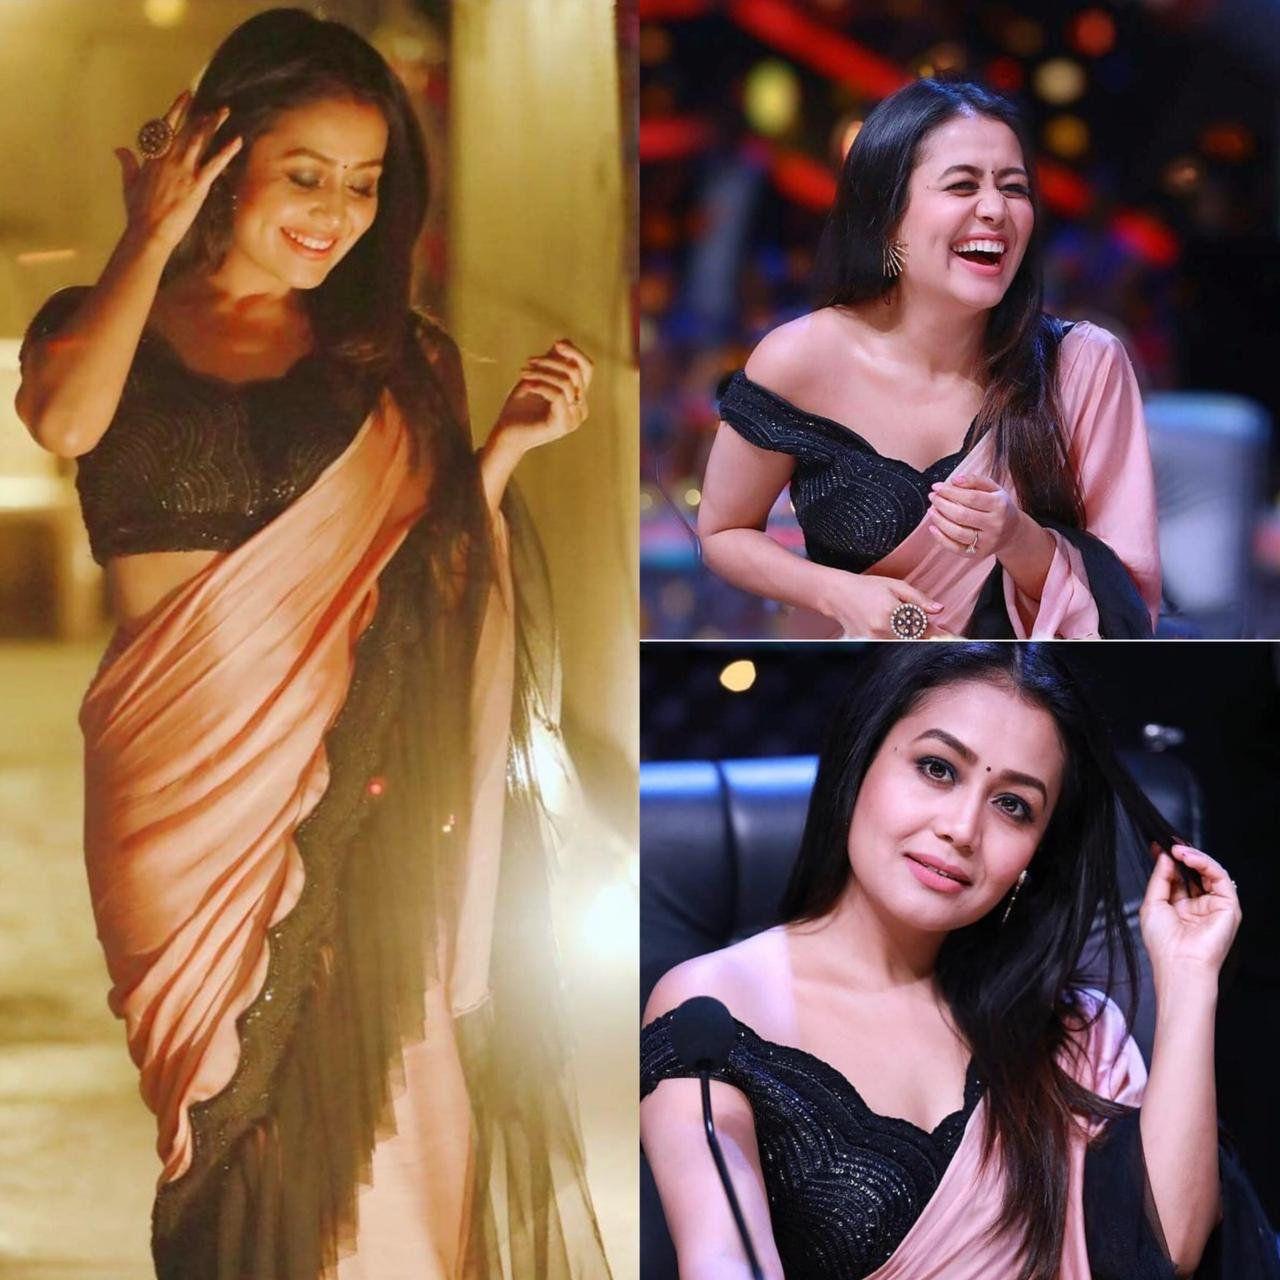 Neha Kakkar Style Peach Black Colour Party Wear Ruffle Saree By Shaliniboutique On Etsy Party Wear Sarees Bollywood Dress Peach Color Saree